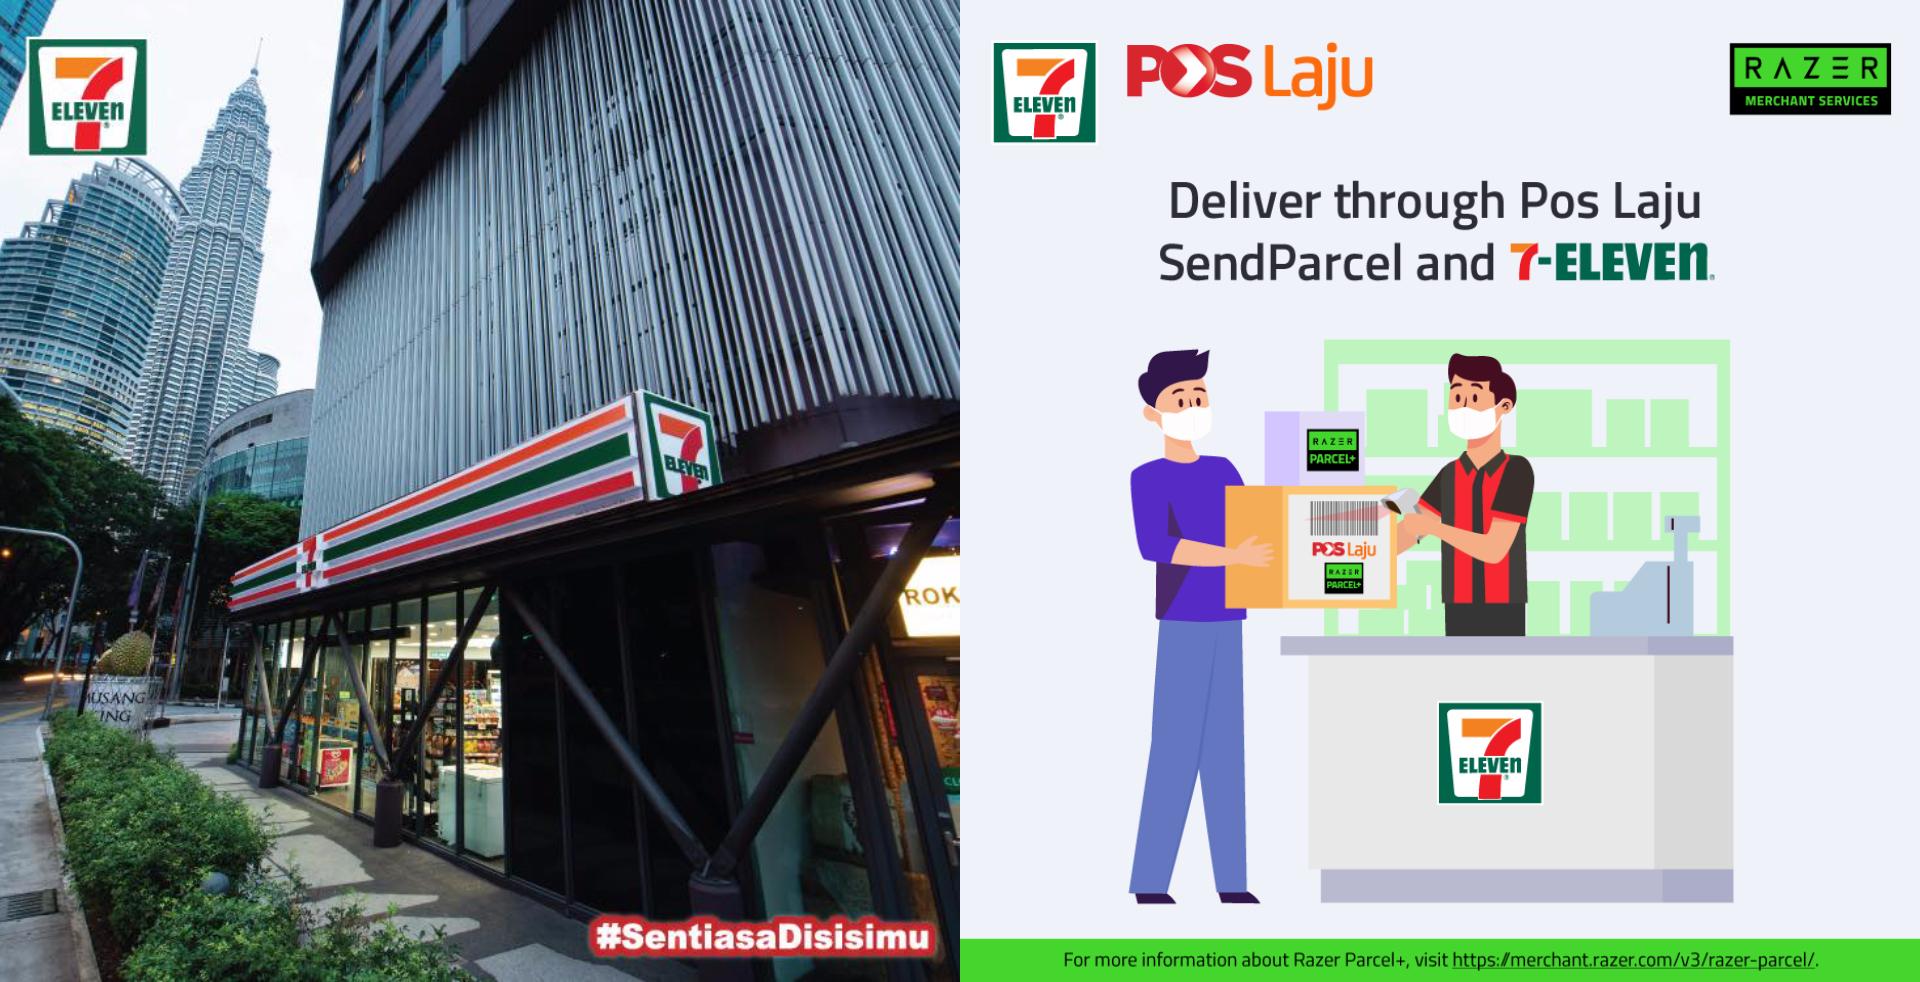 现在民众可以在7-Eleven邮寄包裹!-图摘自7-Eleven Malaysia 脸书-